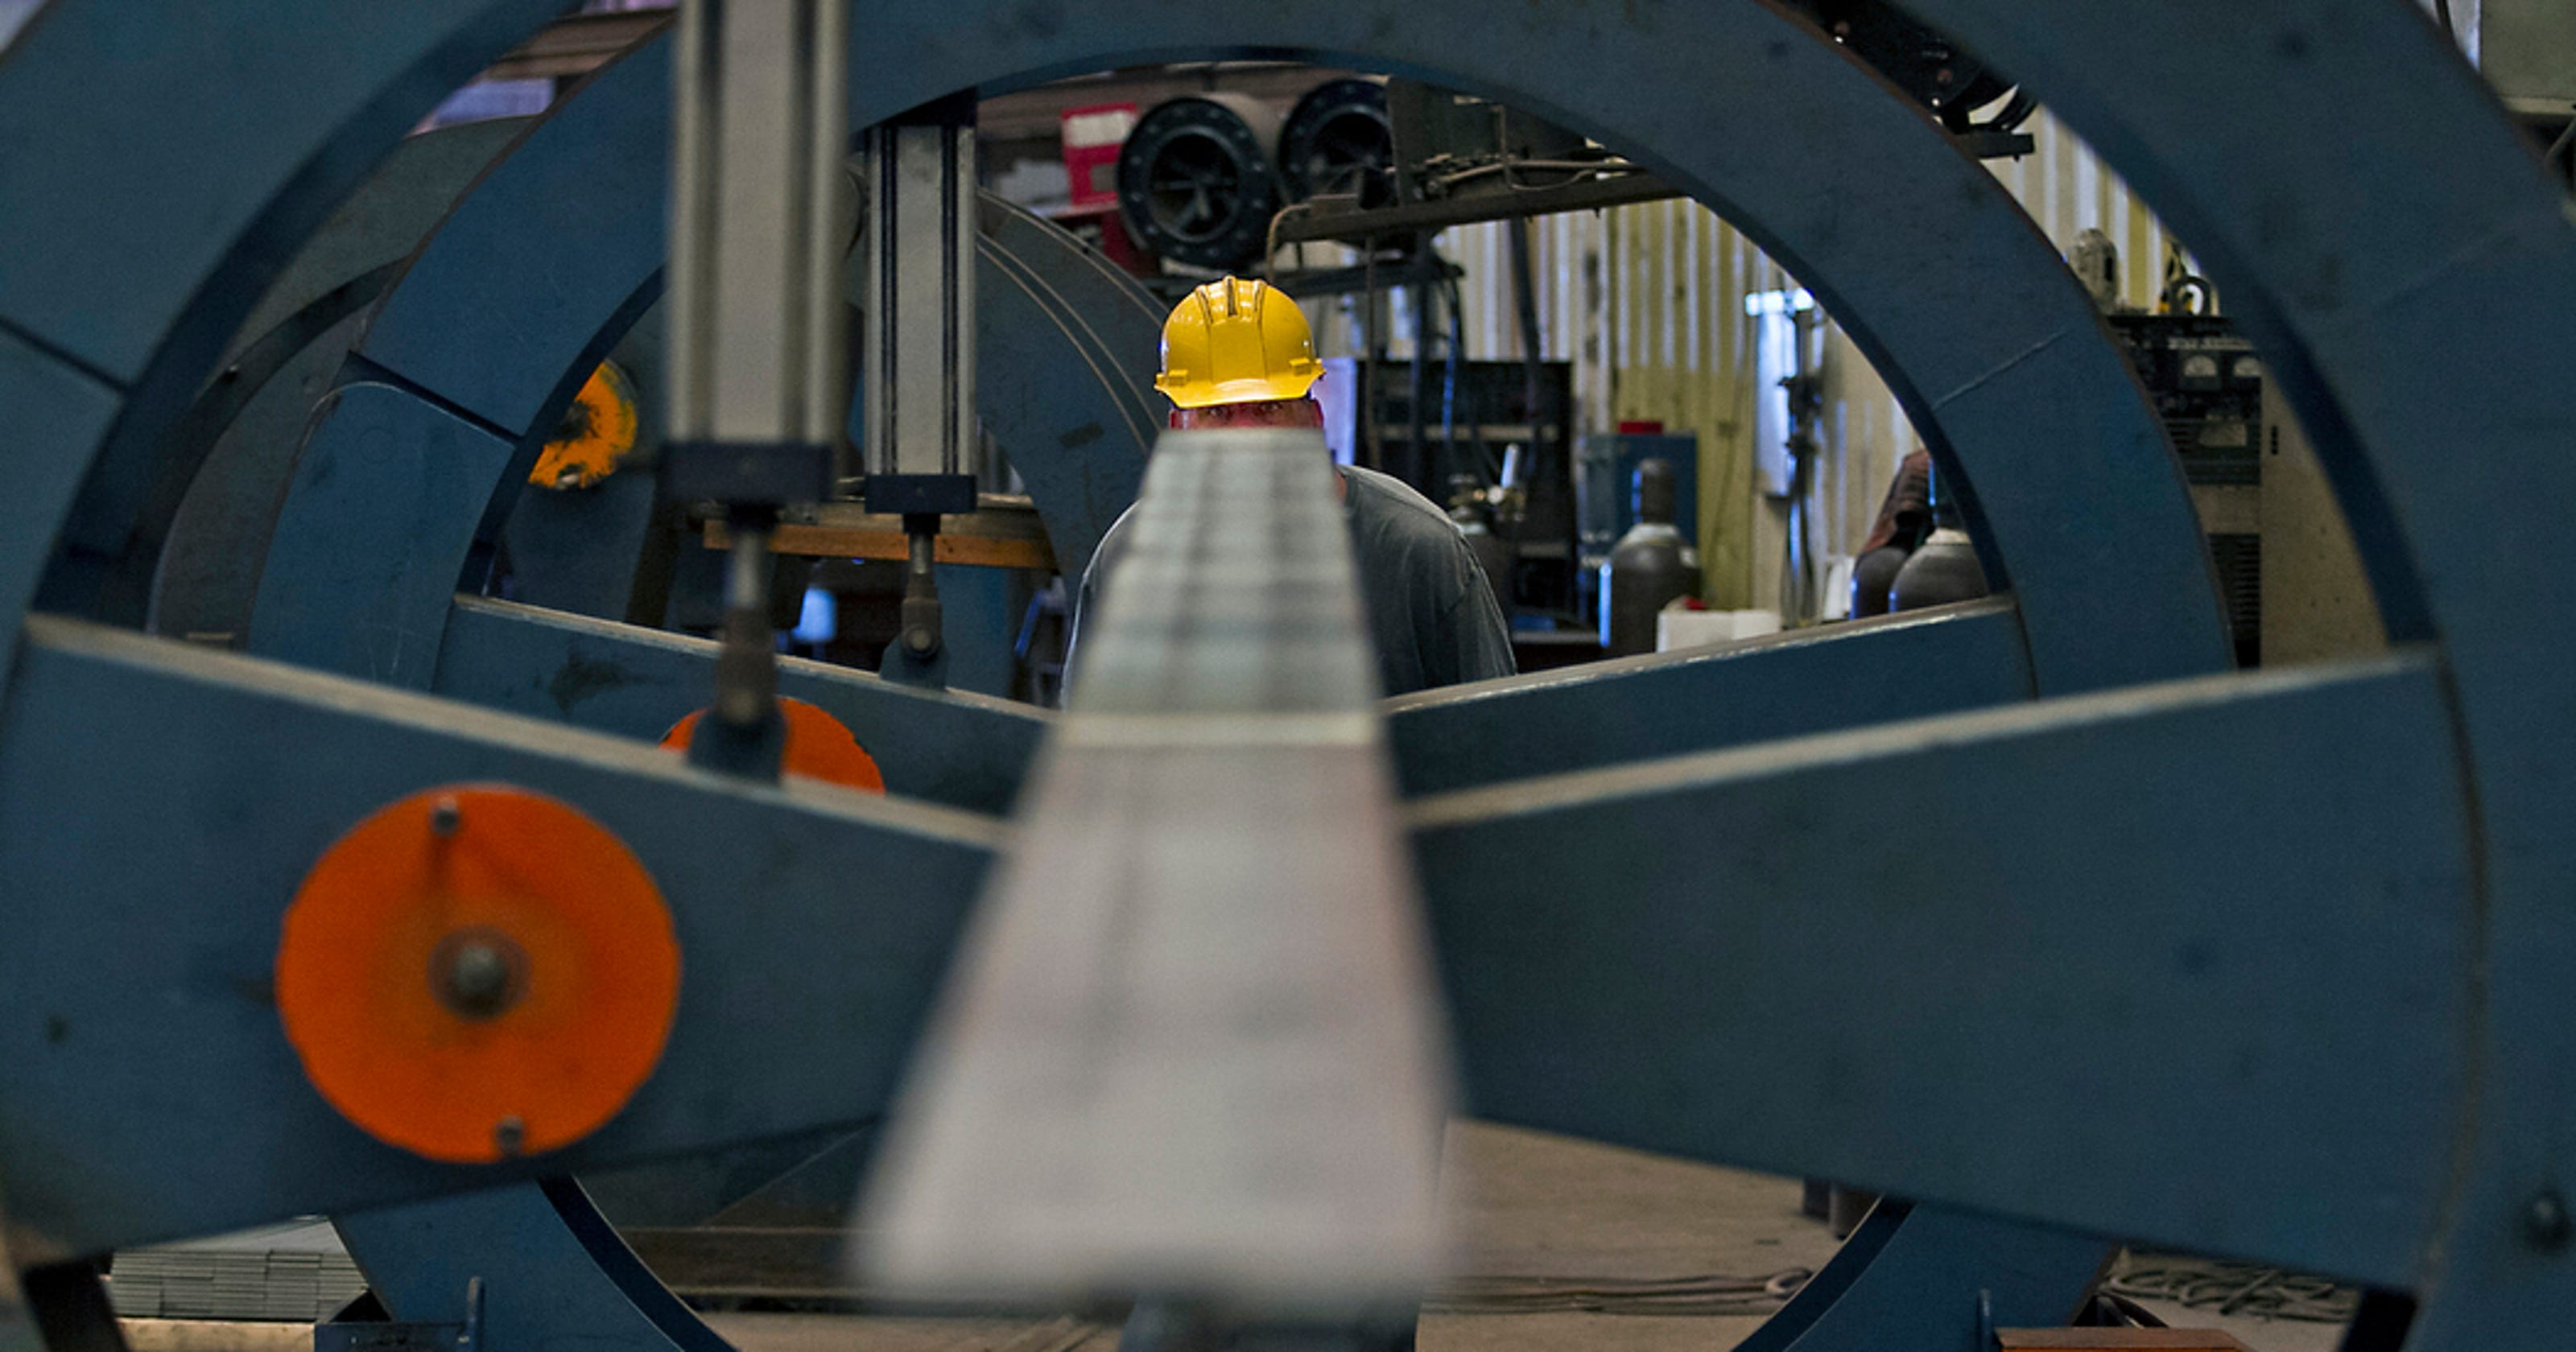 Job marks in Lee, Collier mask growth halt